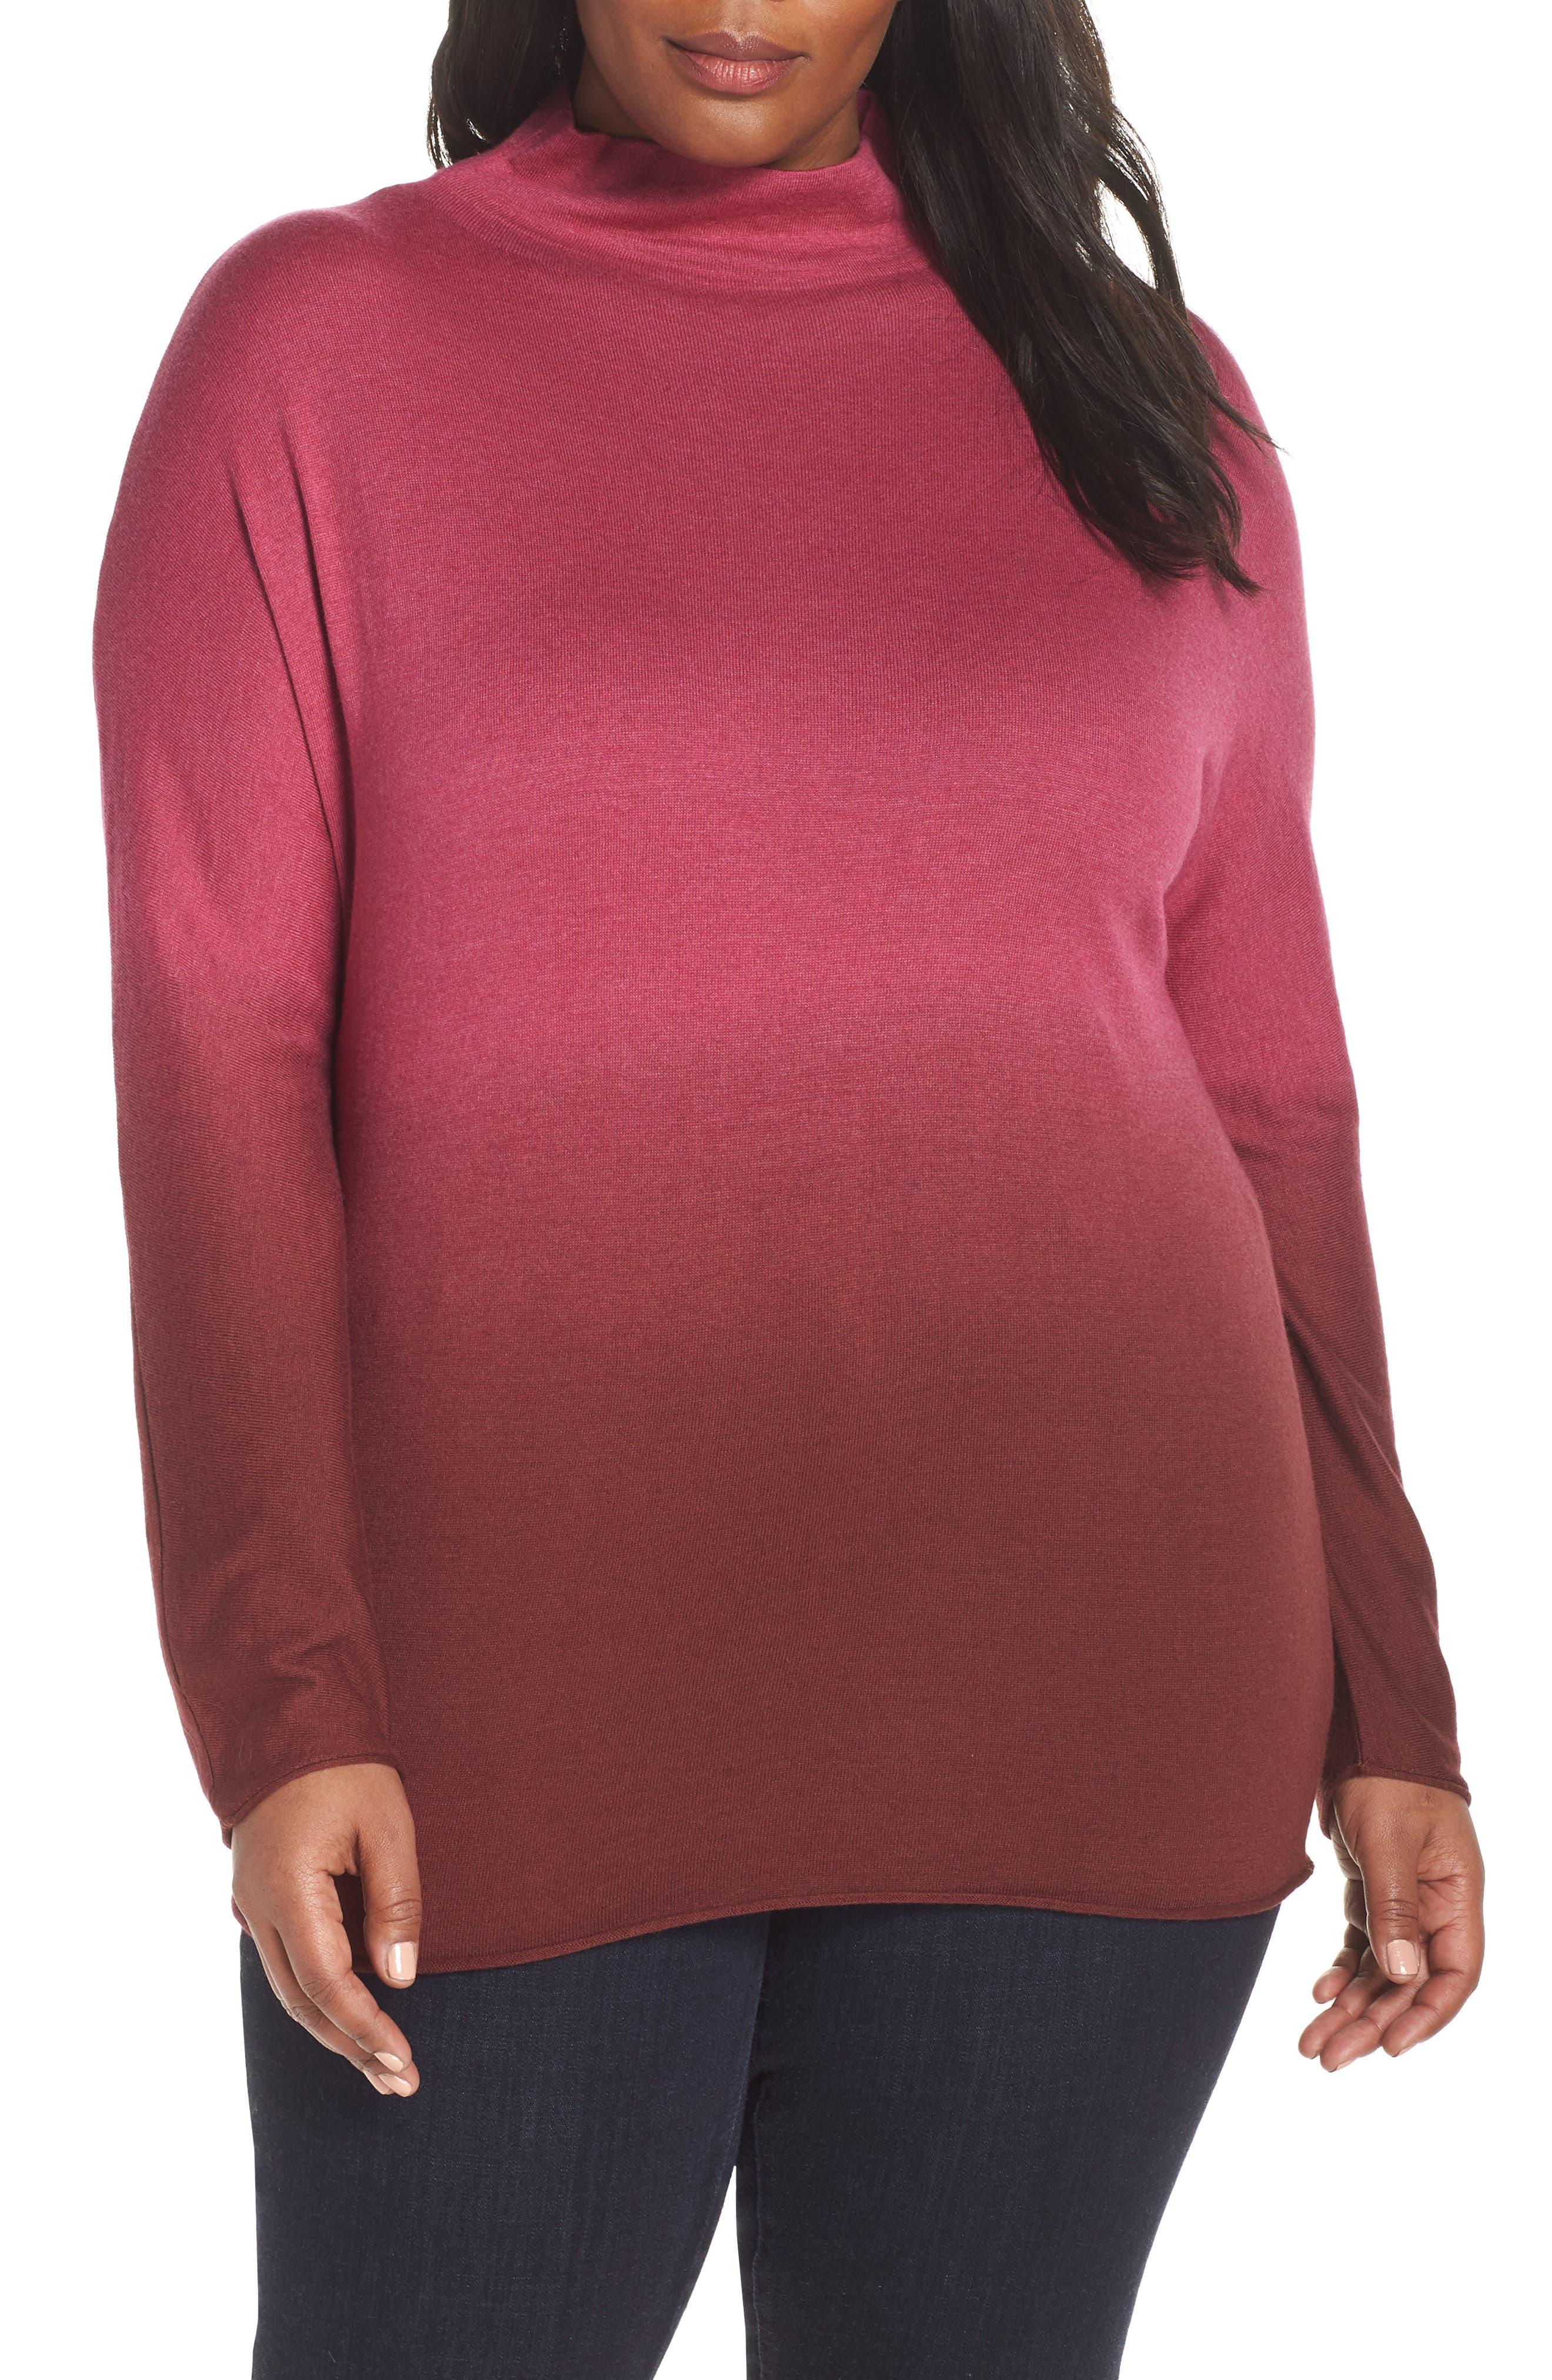 Traveler Funnel Neck Sweater in Radish